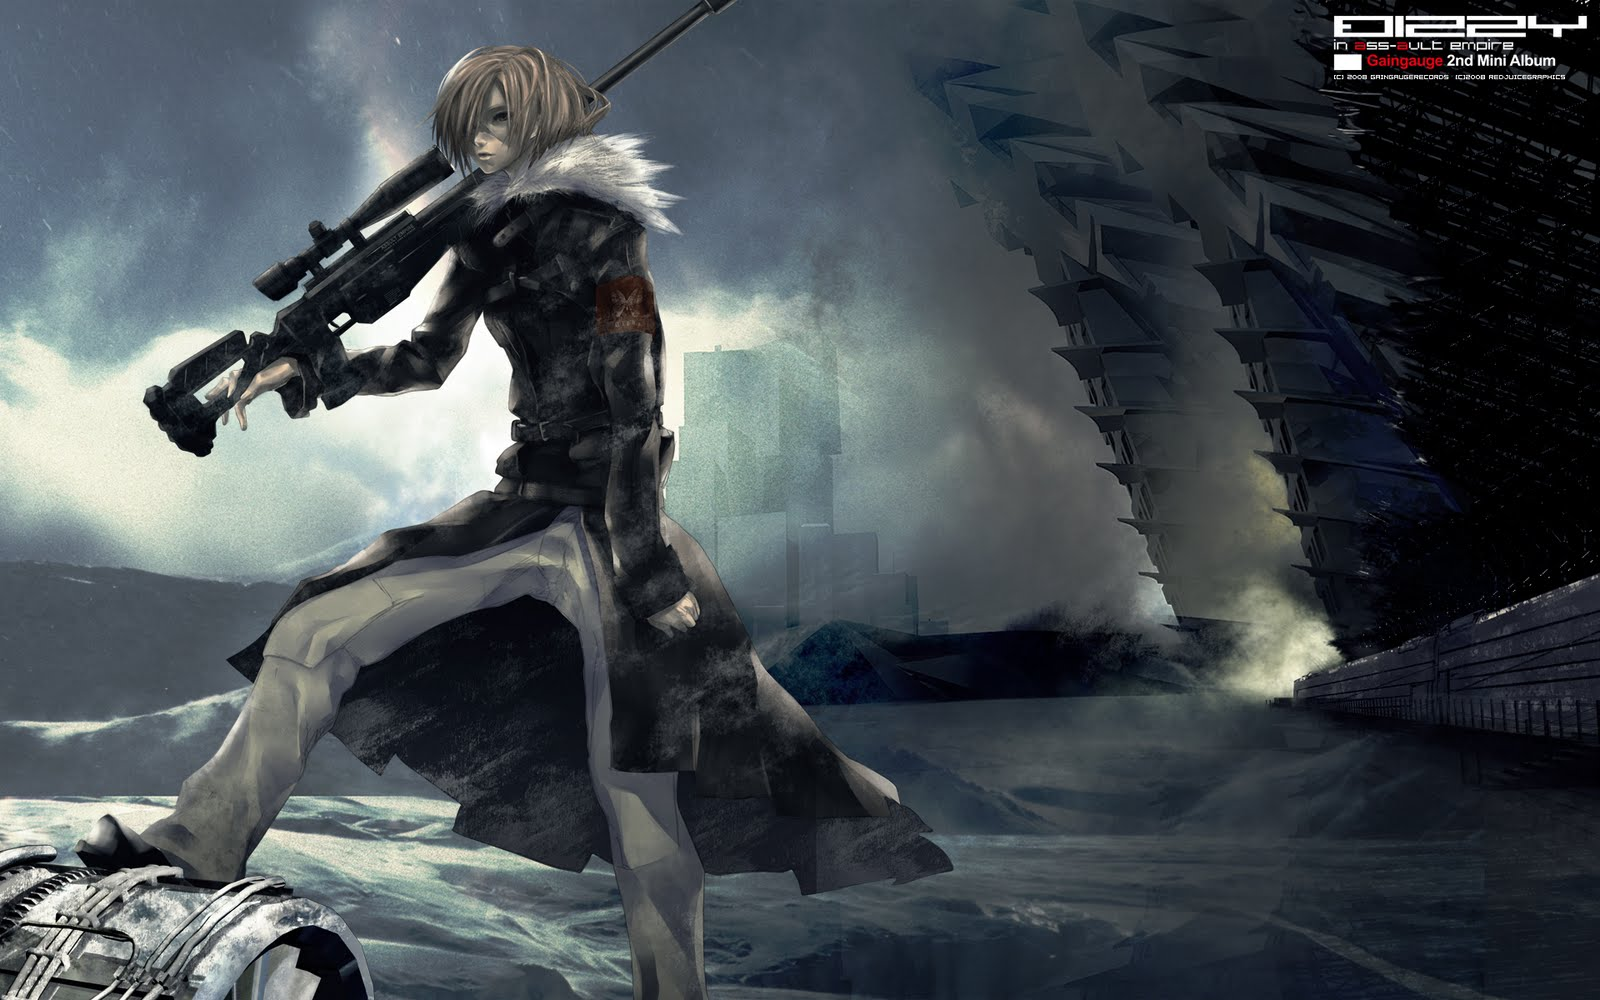 Sniper Rifle anime